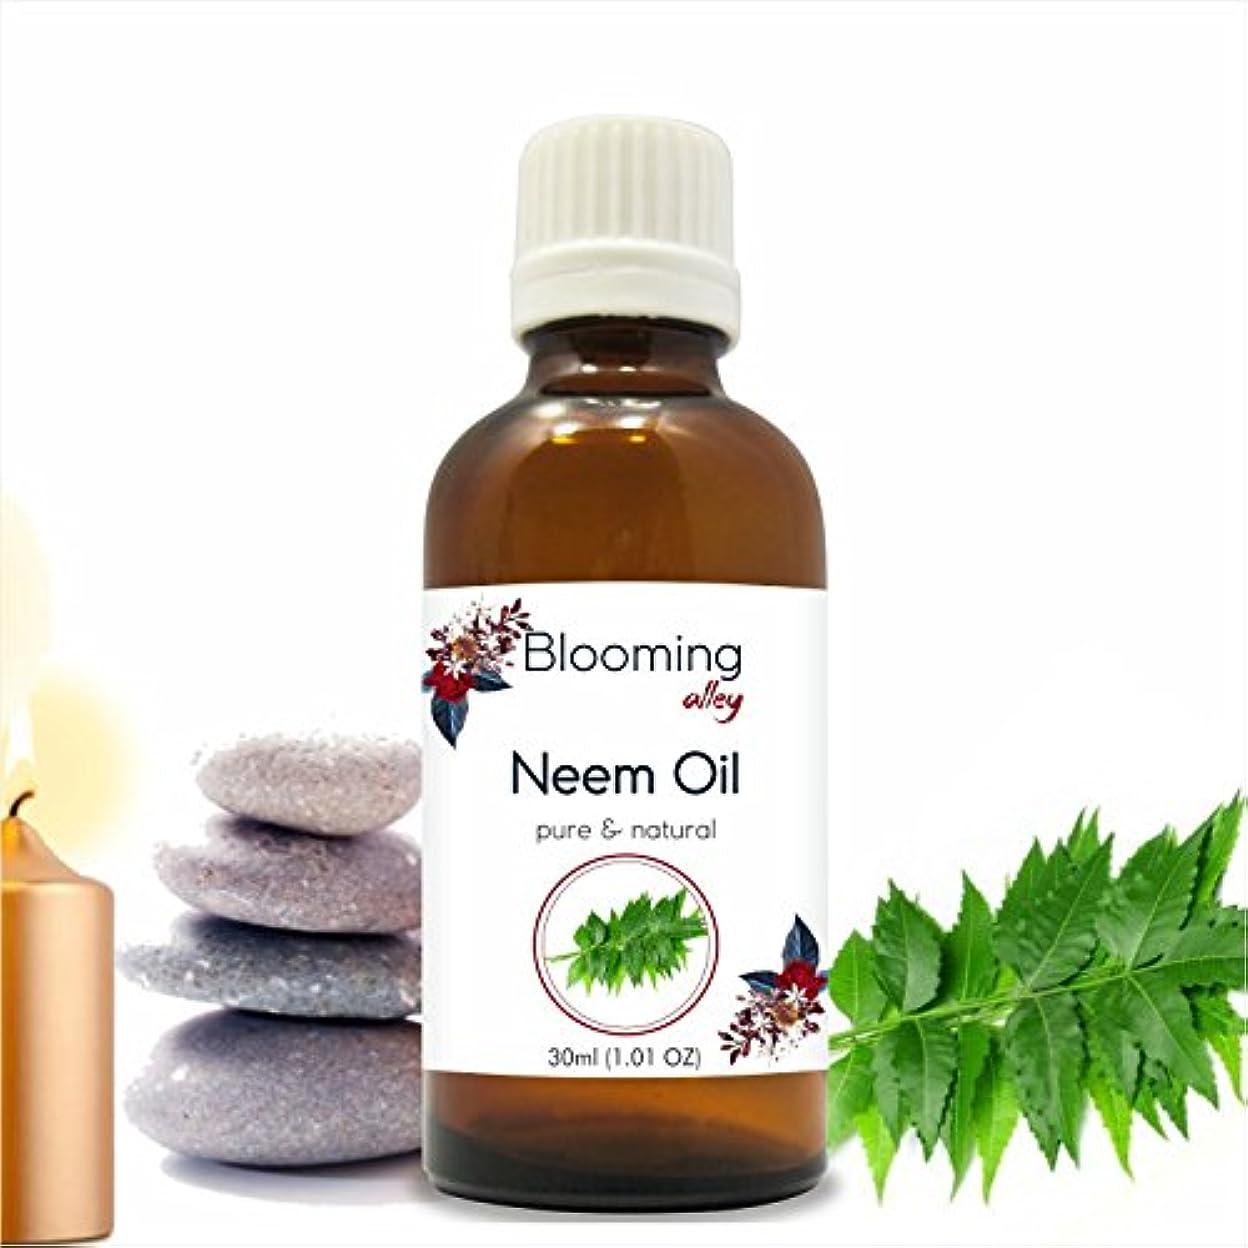 機転赤面応用Neem Oil (Azadirachta Indica) Essential Oil 30 ml or 1.0 Fl Oz by Blooming Alley